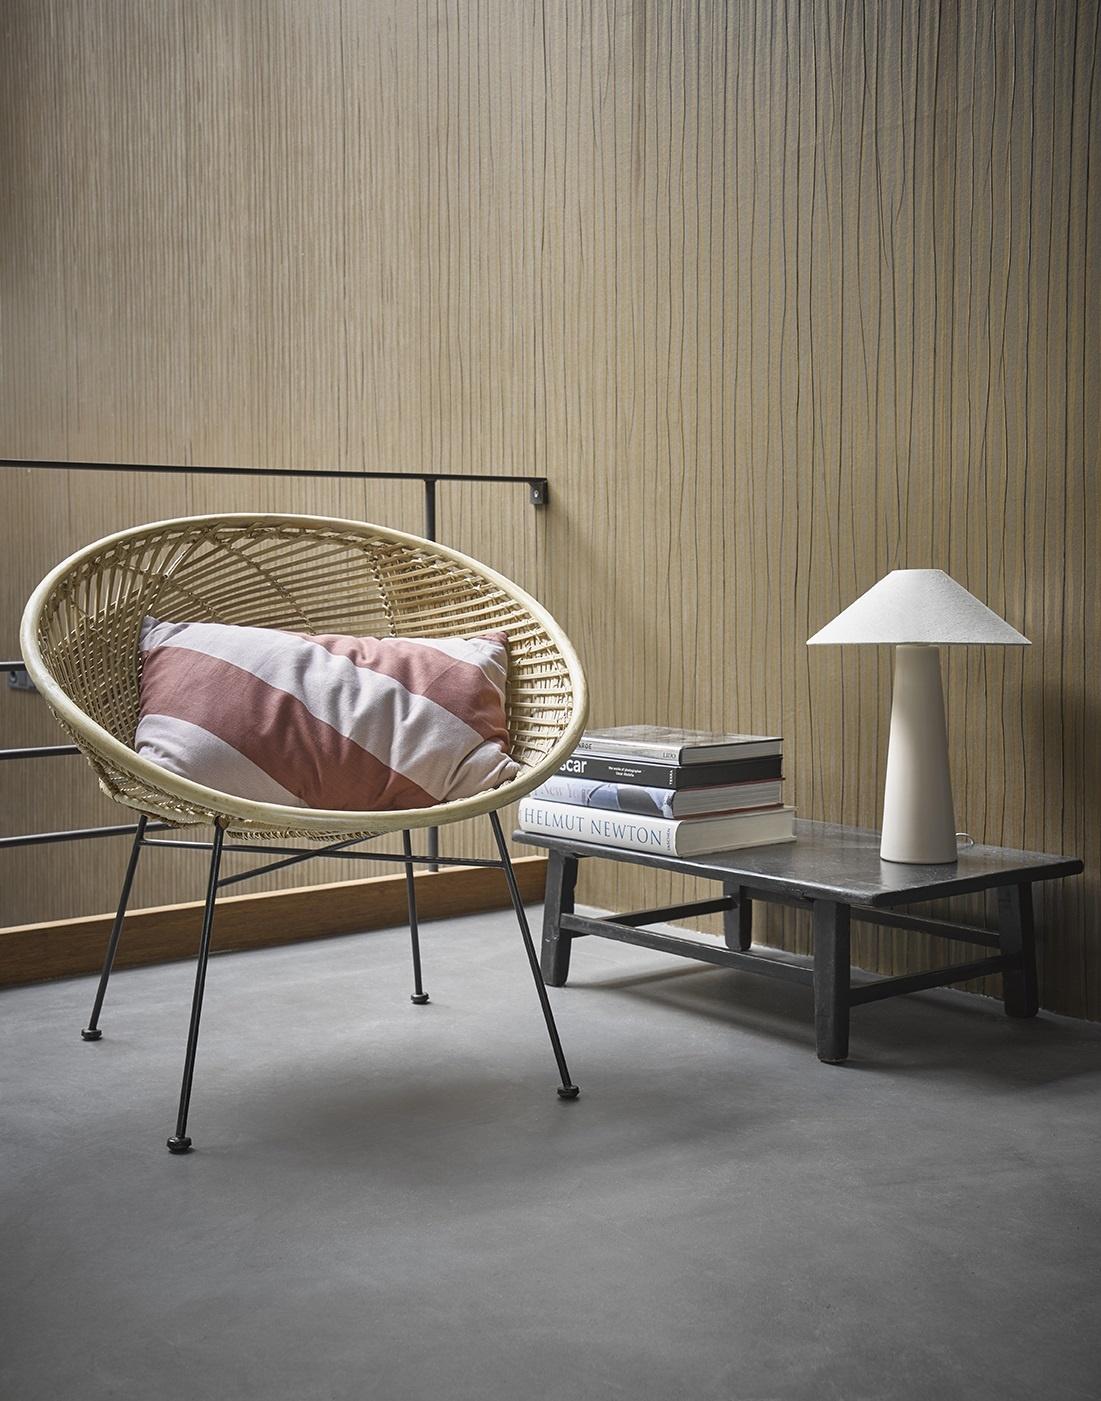 Stoel rattan ball lounge chair natural-2